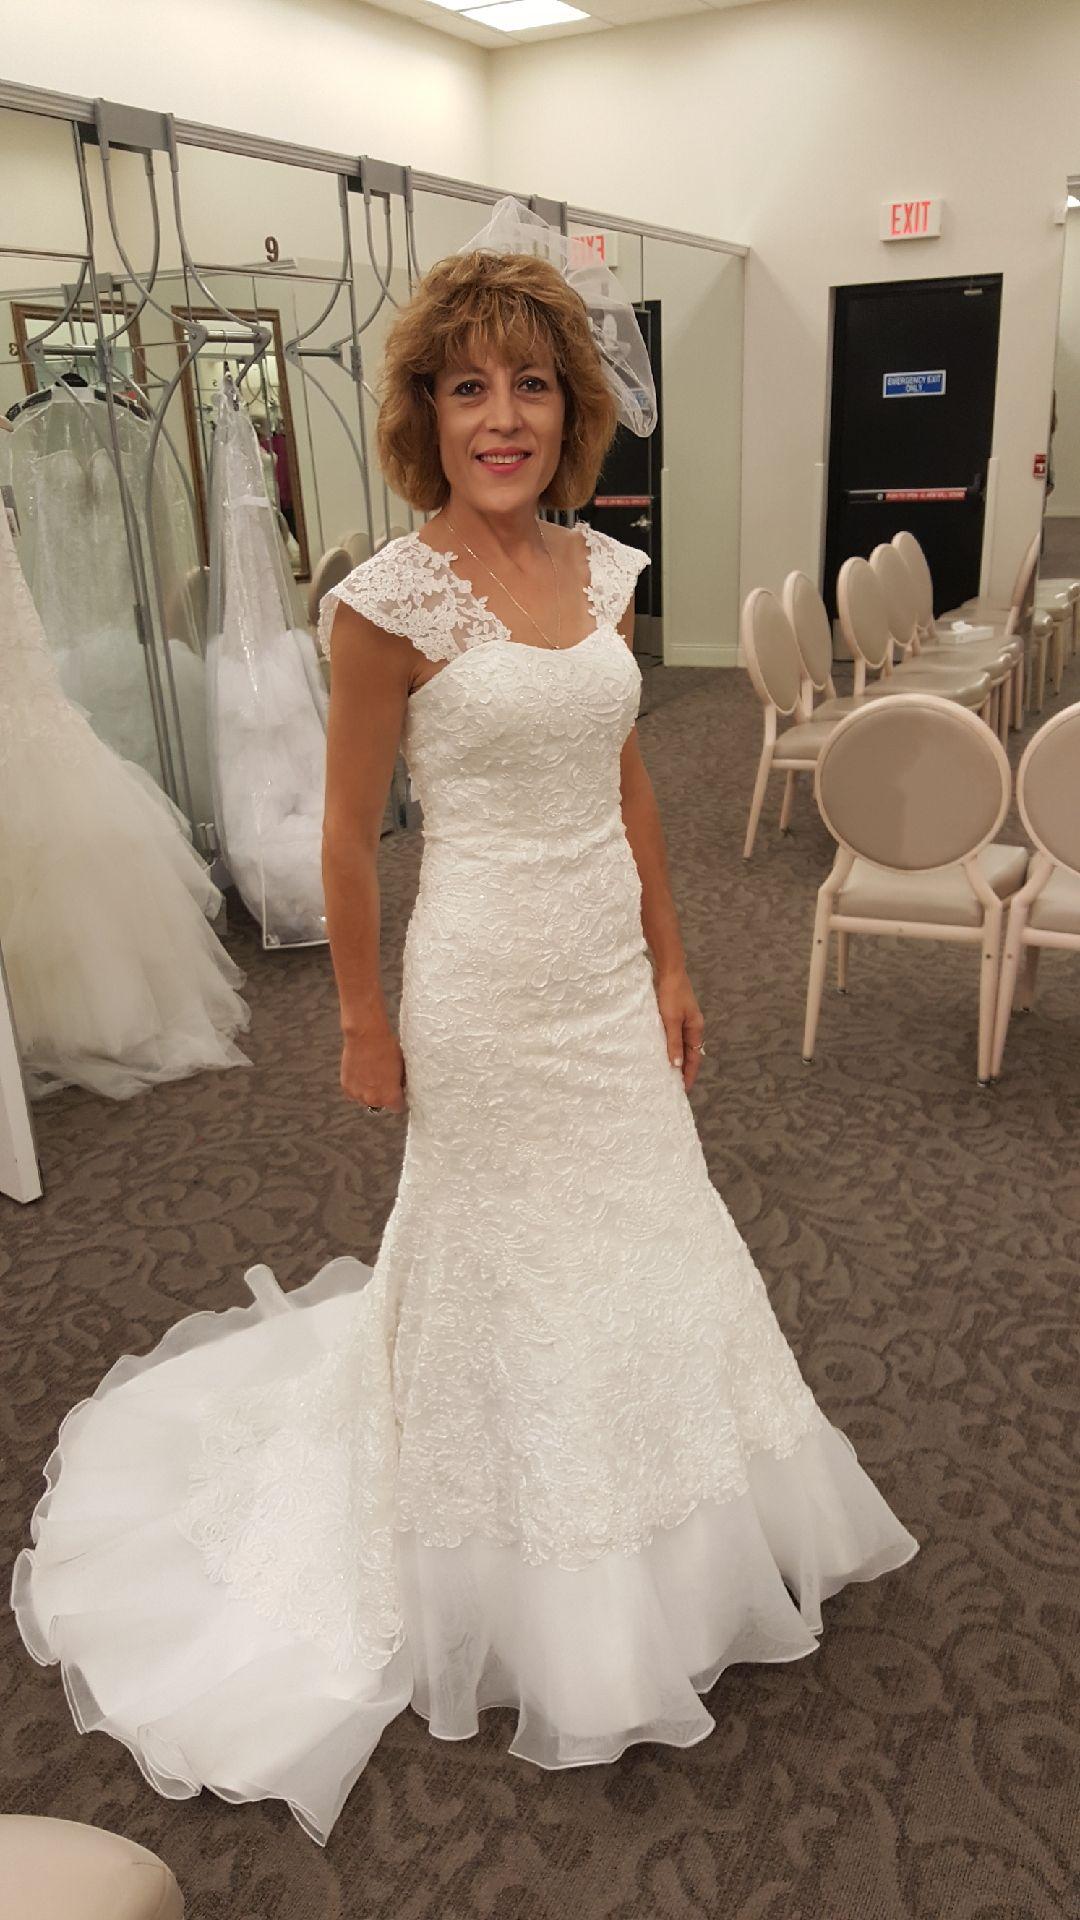 Wedding dress suit  Pin by Rodica Lupu on Wedding ideas  Pinterest  Wedding